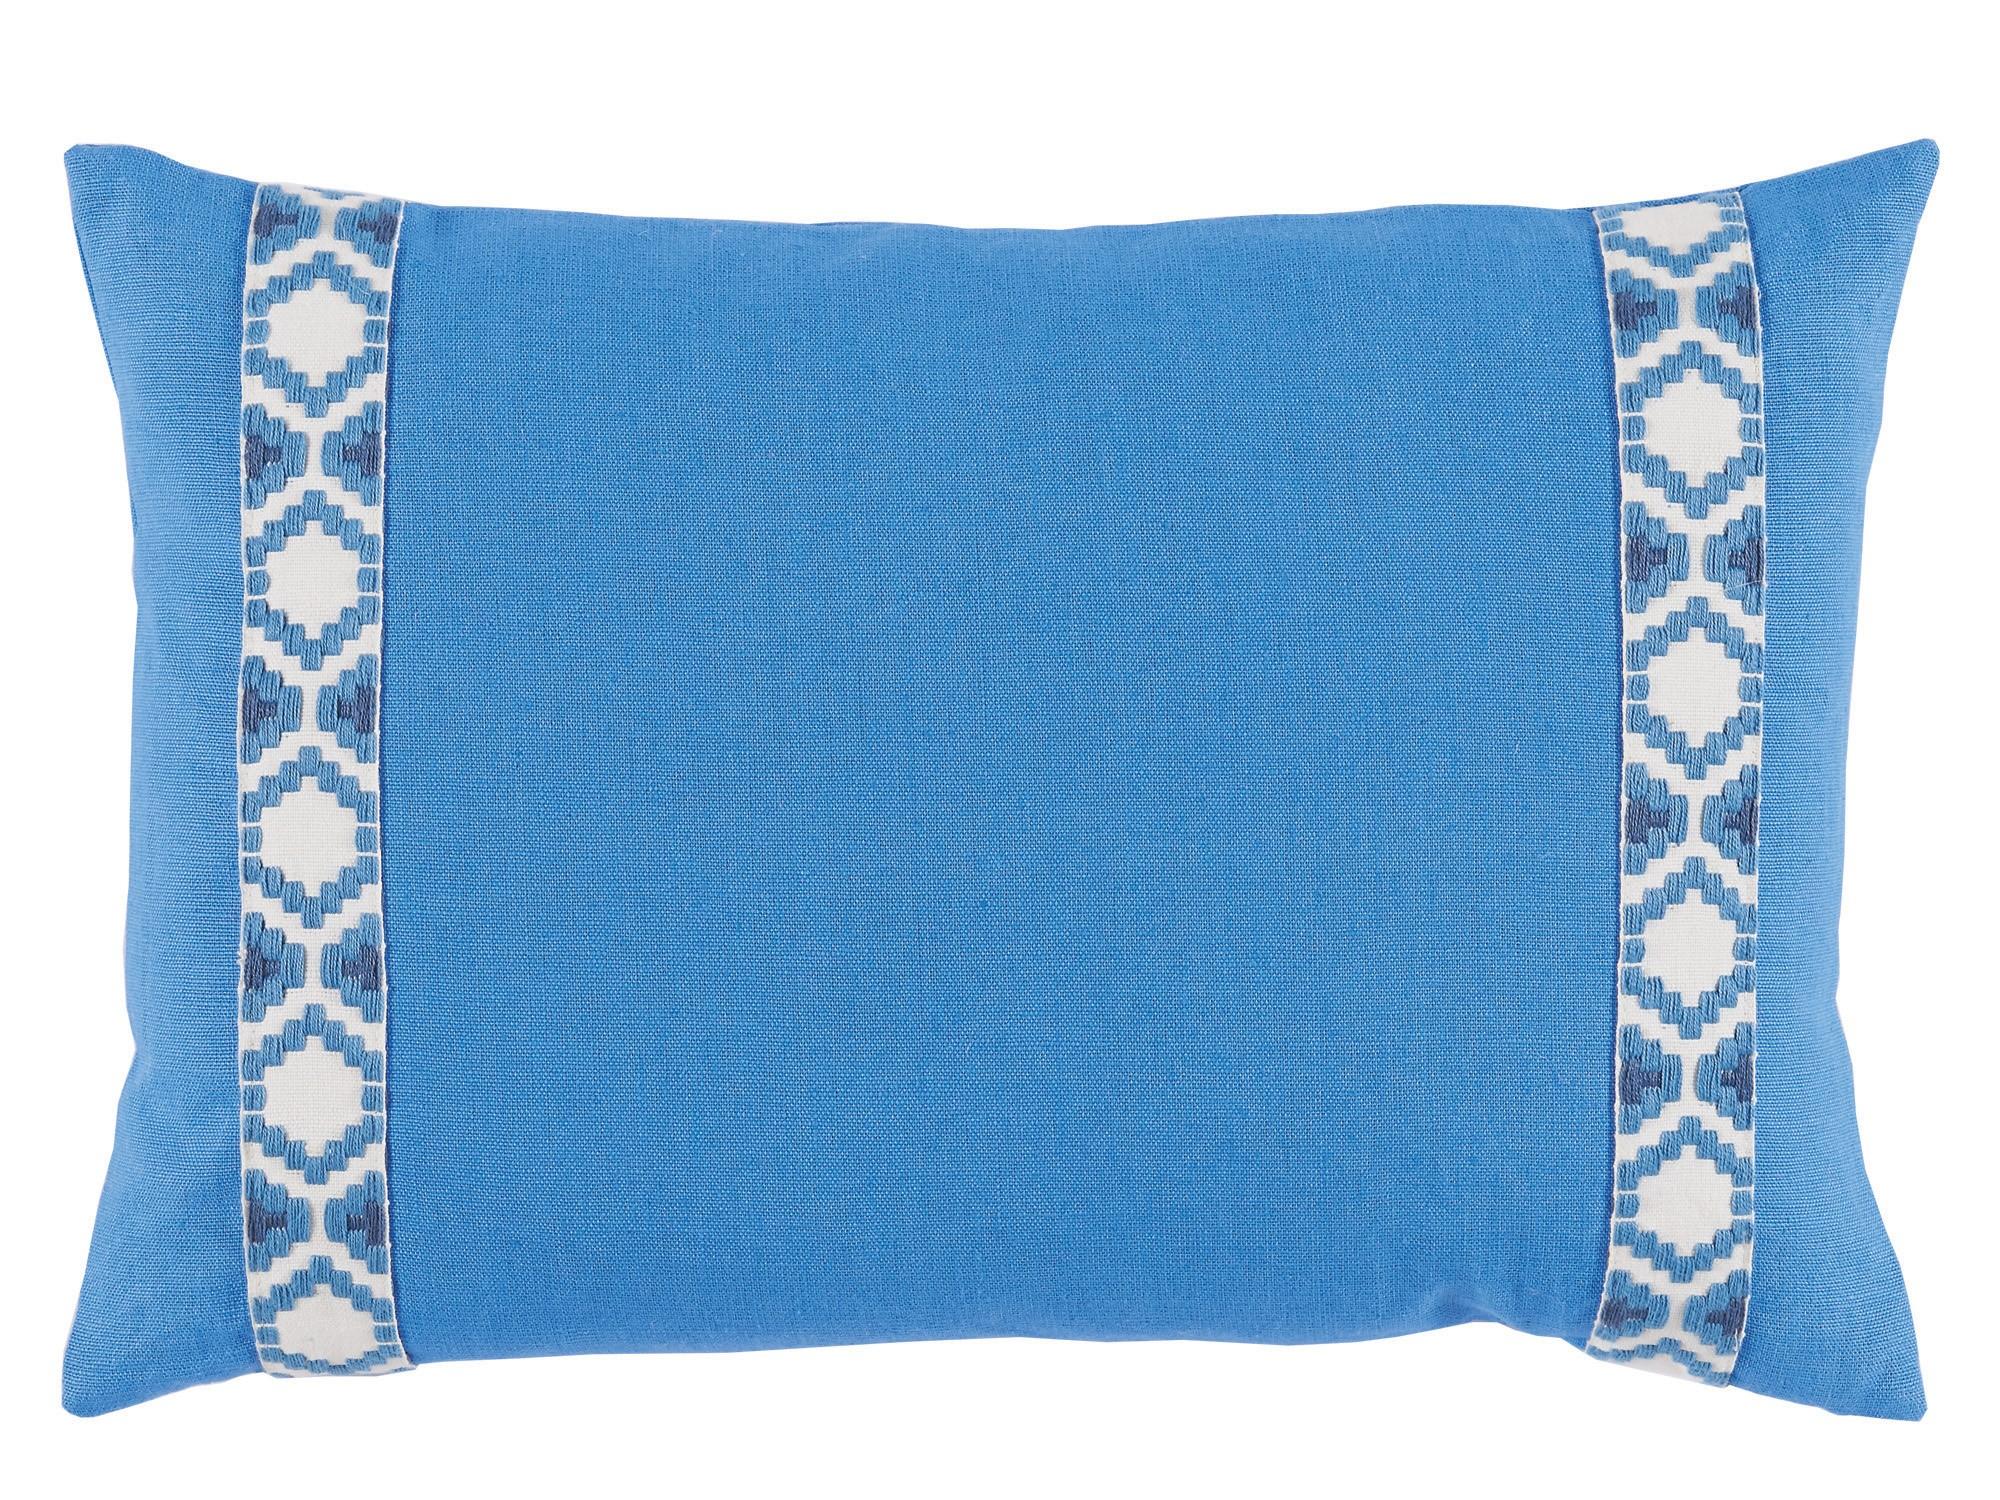 Lacefield Royal Linen With Regatta On White Camden Tape Lumbar Pillow Tuvalu Coastal Home Furnishings